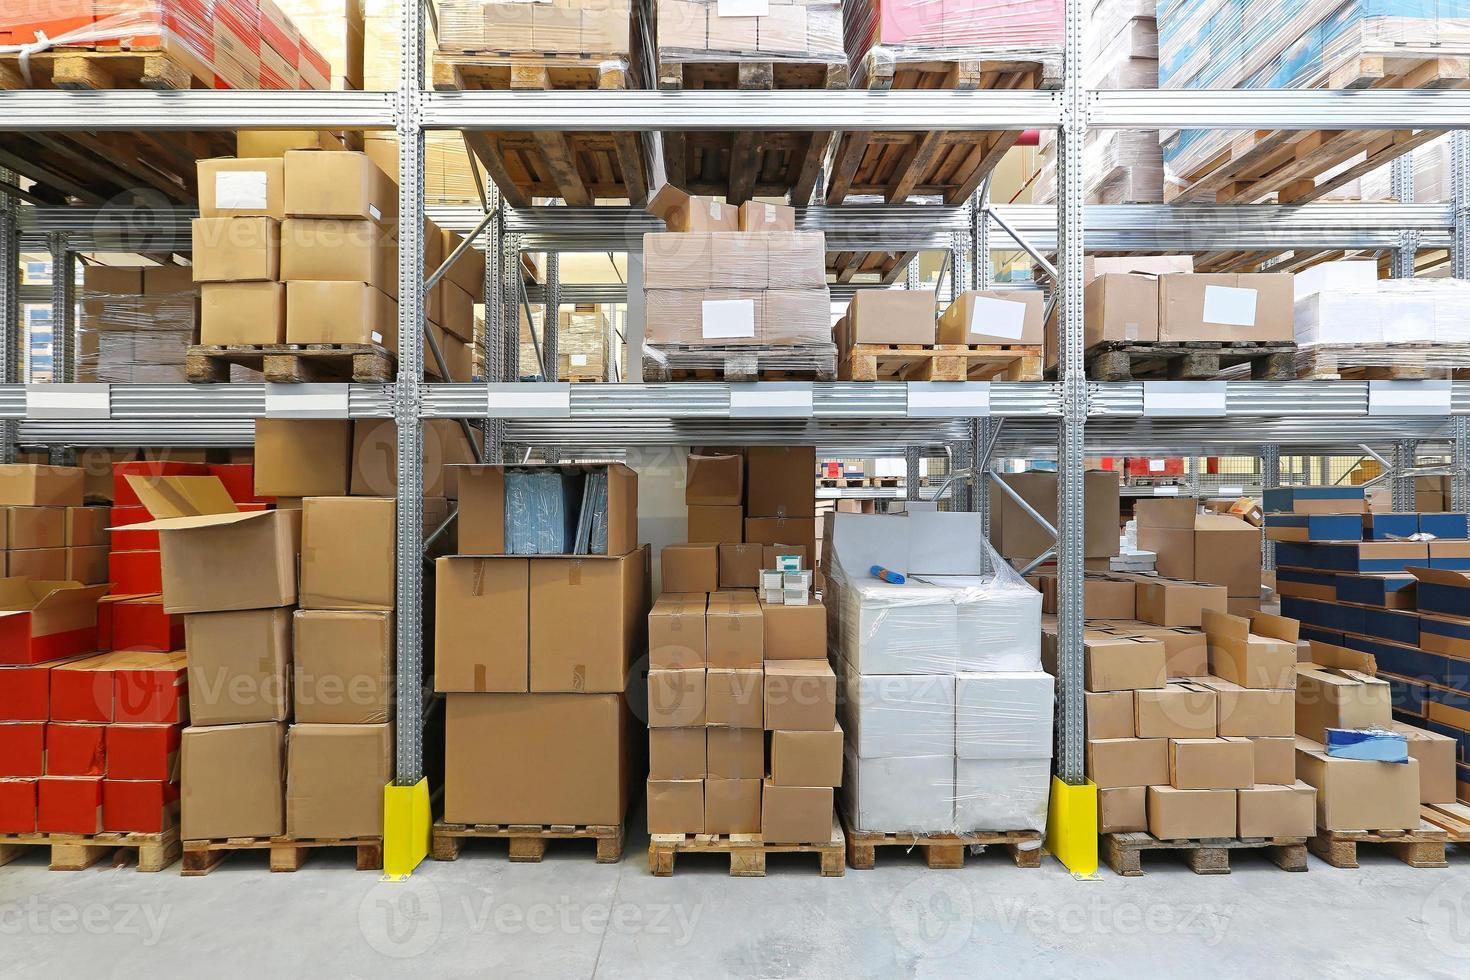 Distribution center photo